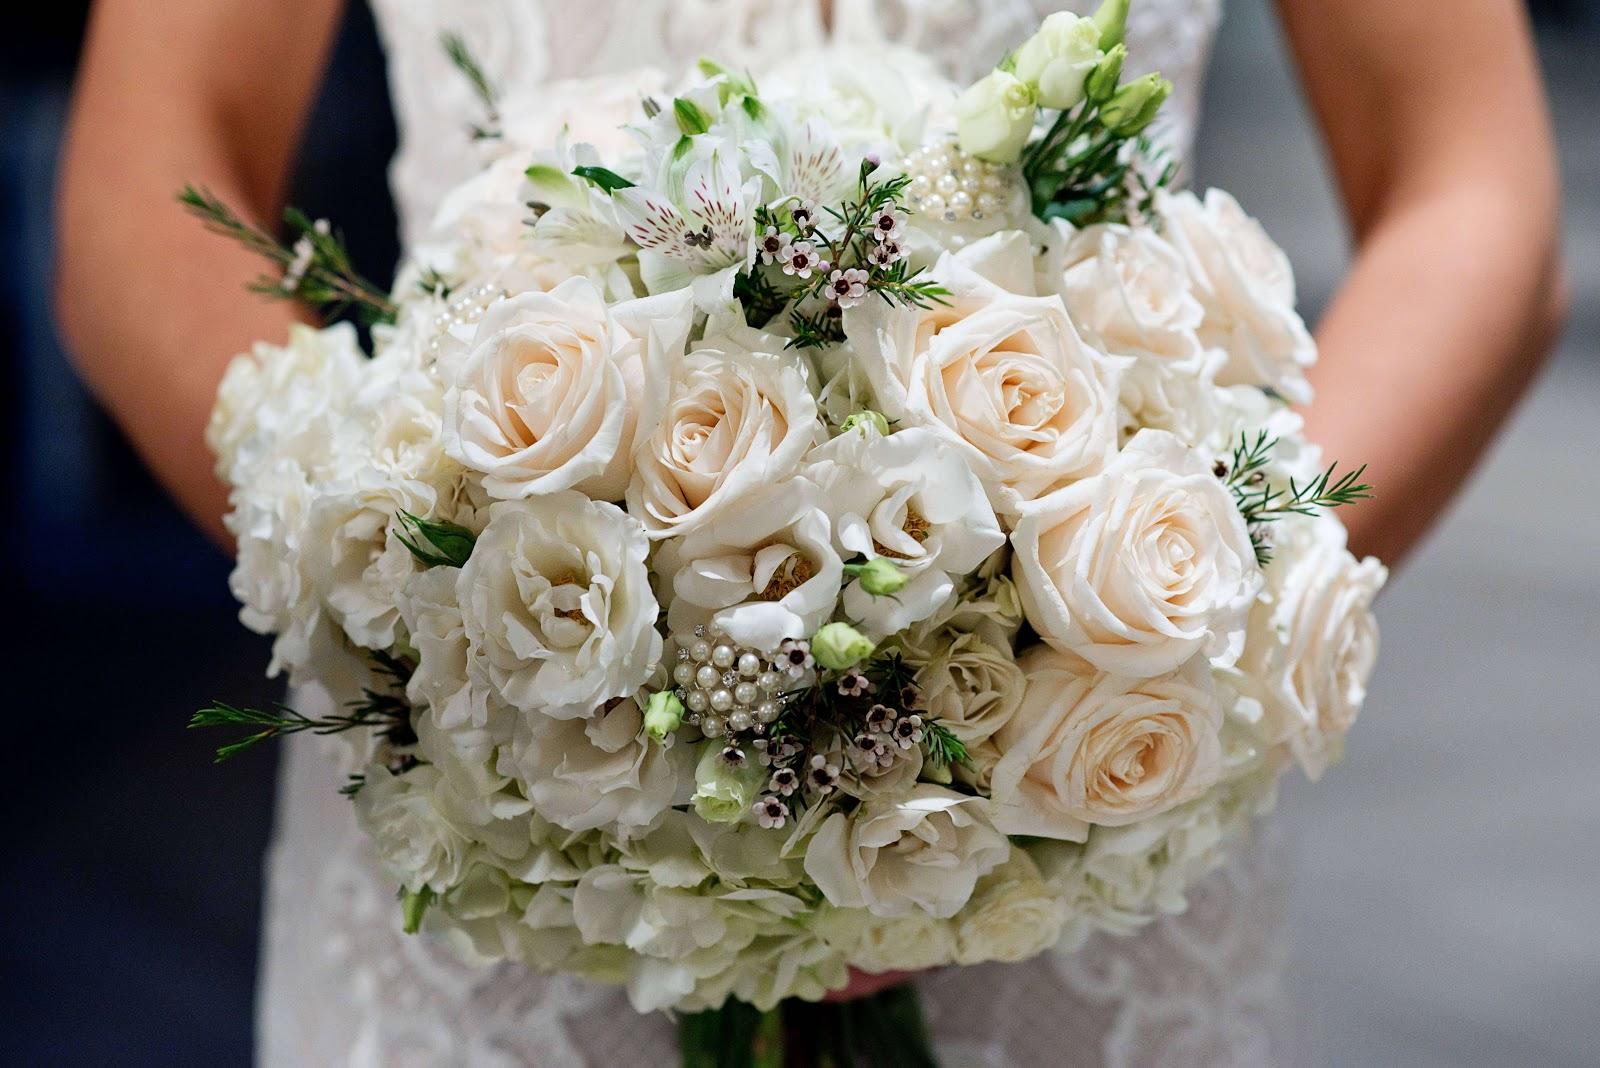 Royal Weddings by Cathy Johnson